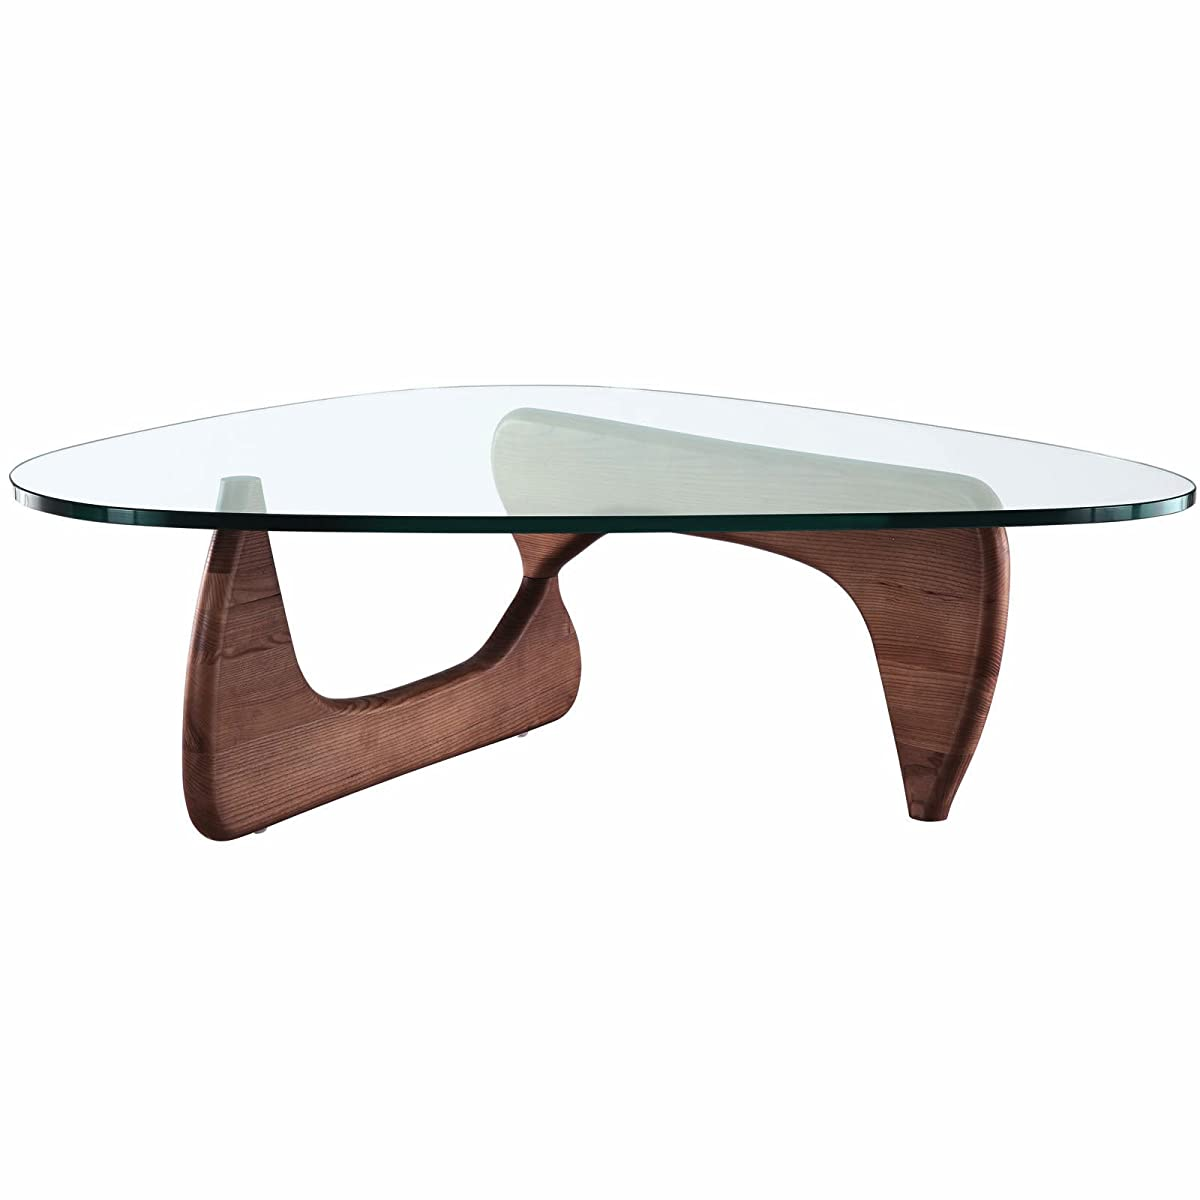 EMODERN FURNITURE eMod - Noguchi Style Coffee Table Reproduction Replica Mid Walnut